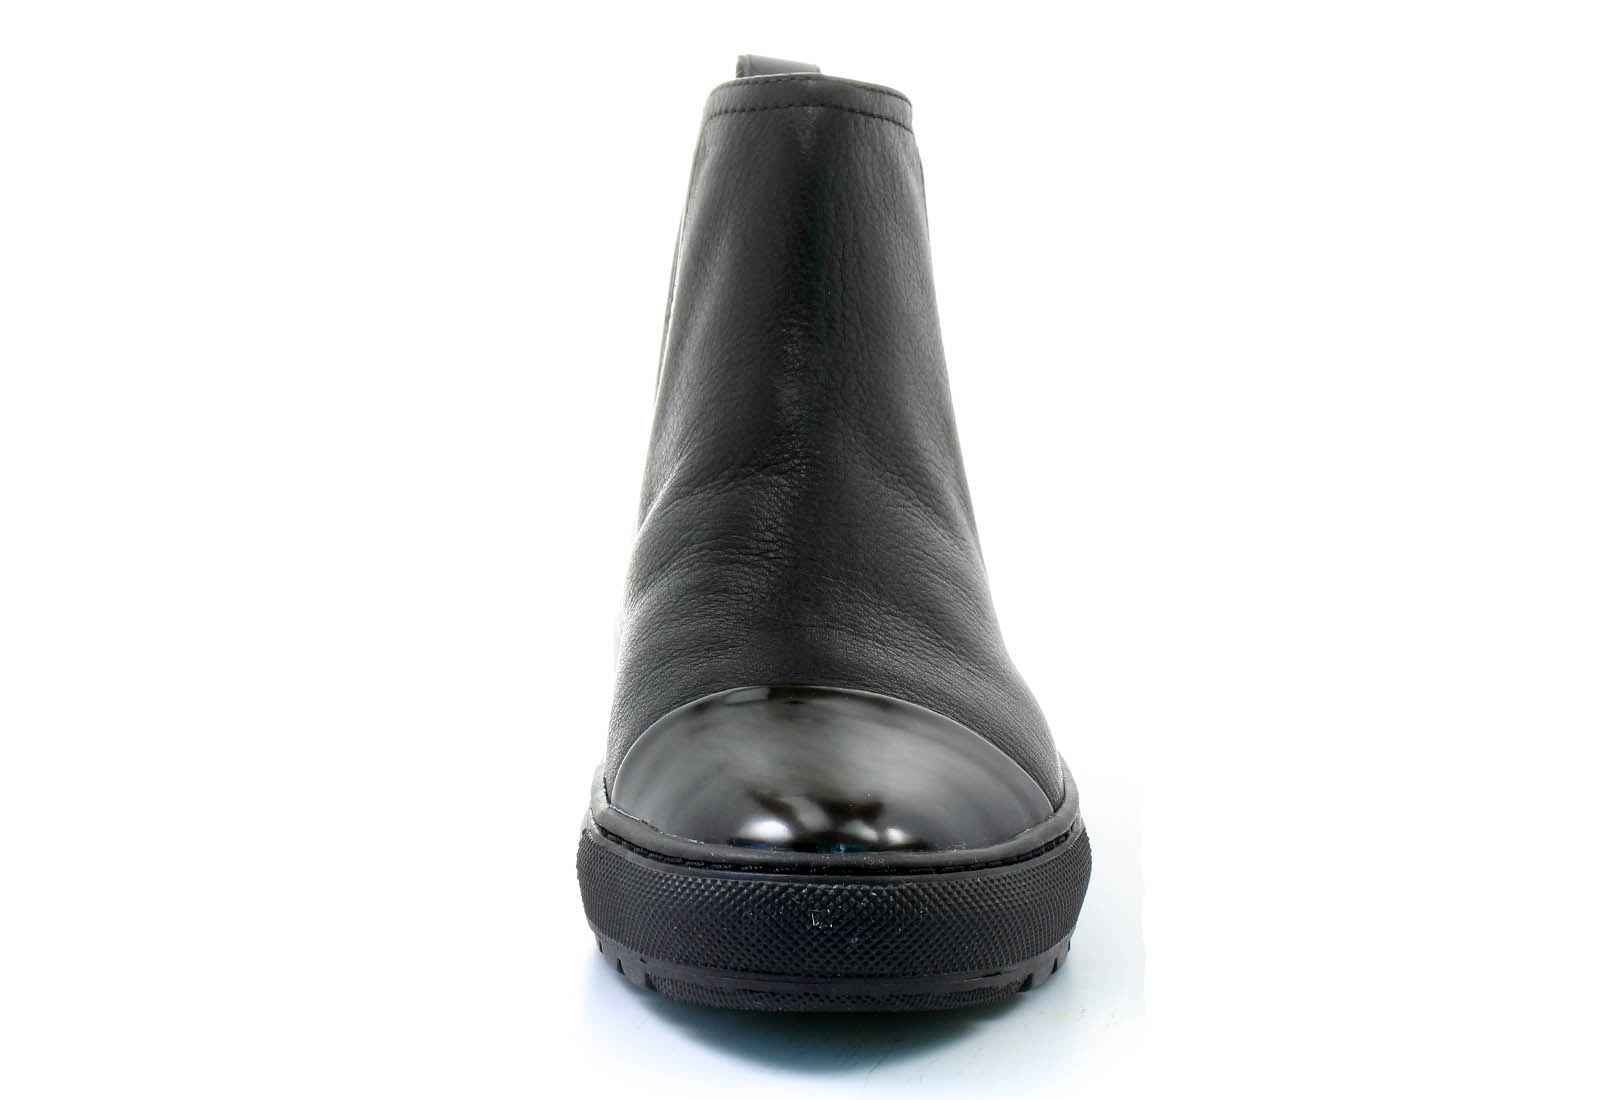 Geox Casual Crna Cipele Breeda Office Shoes Srbija